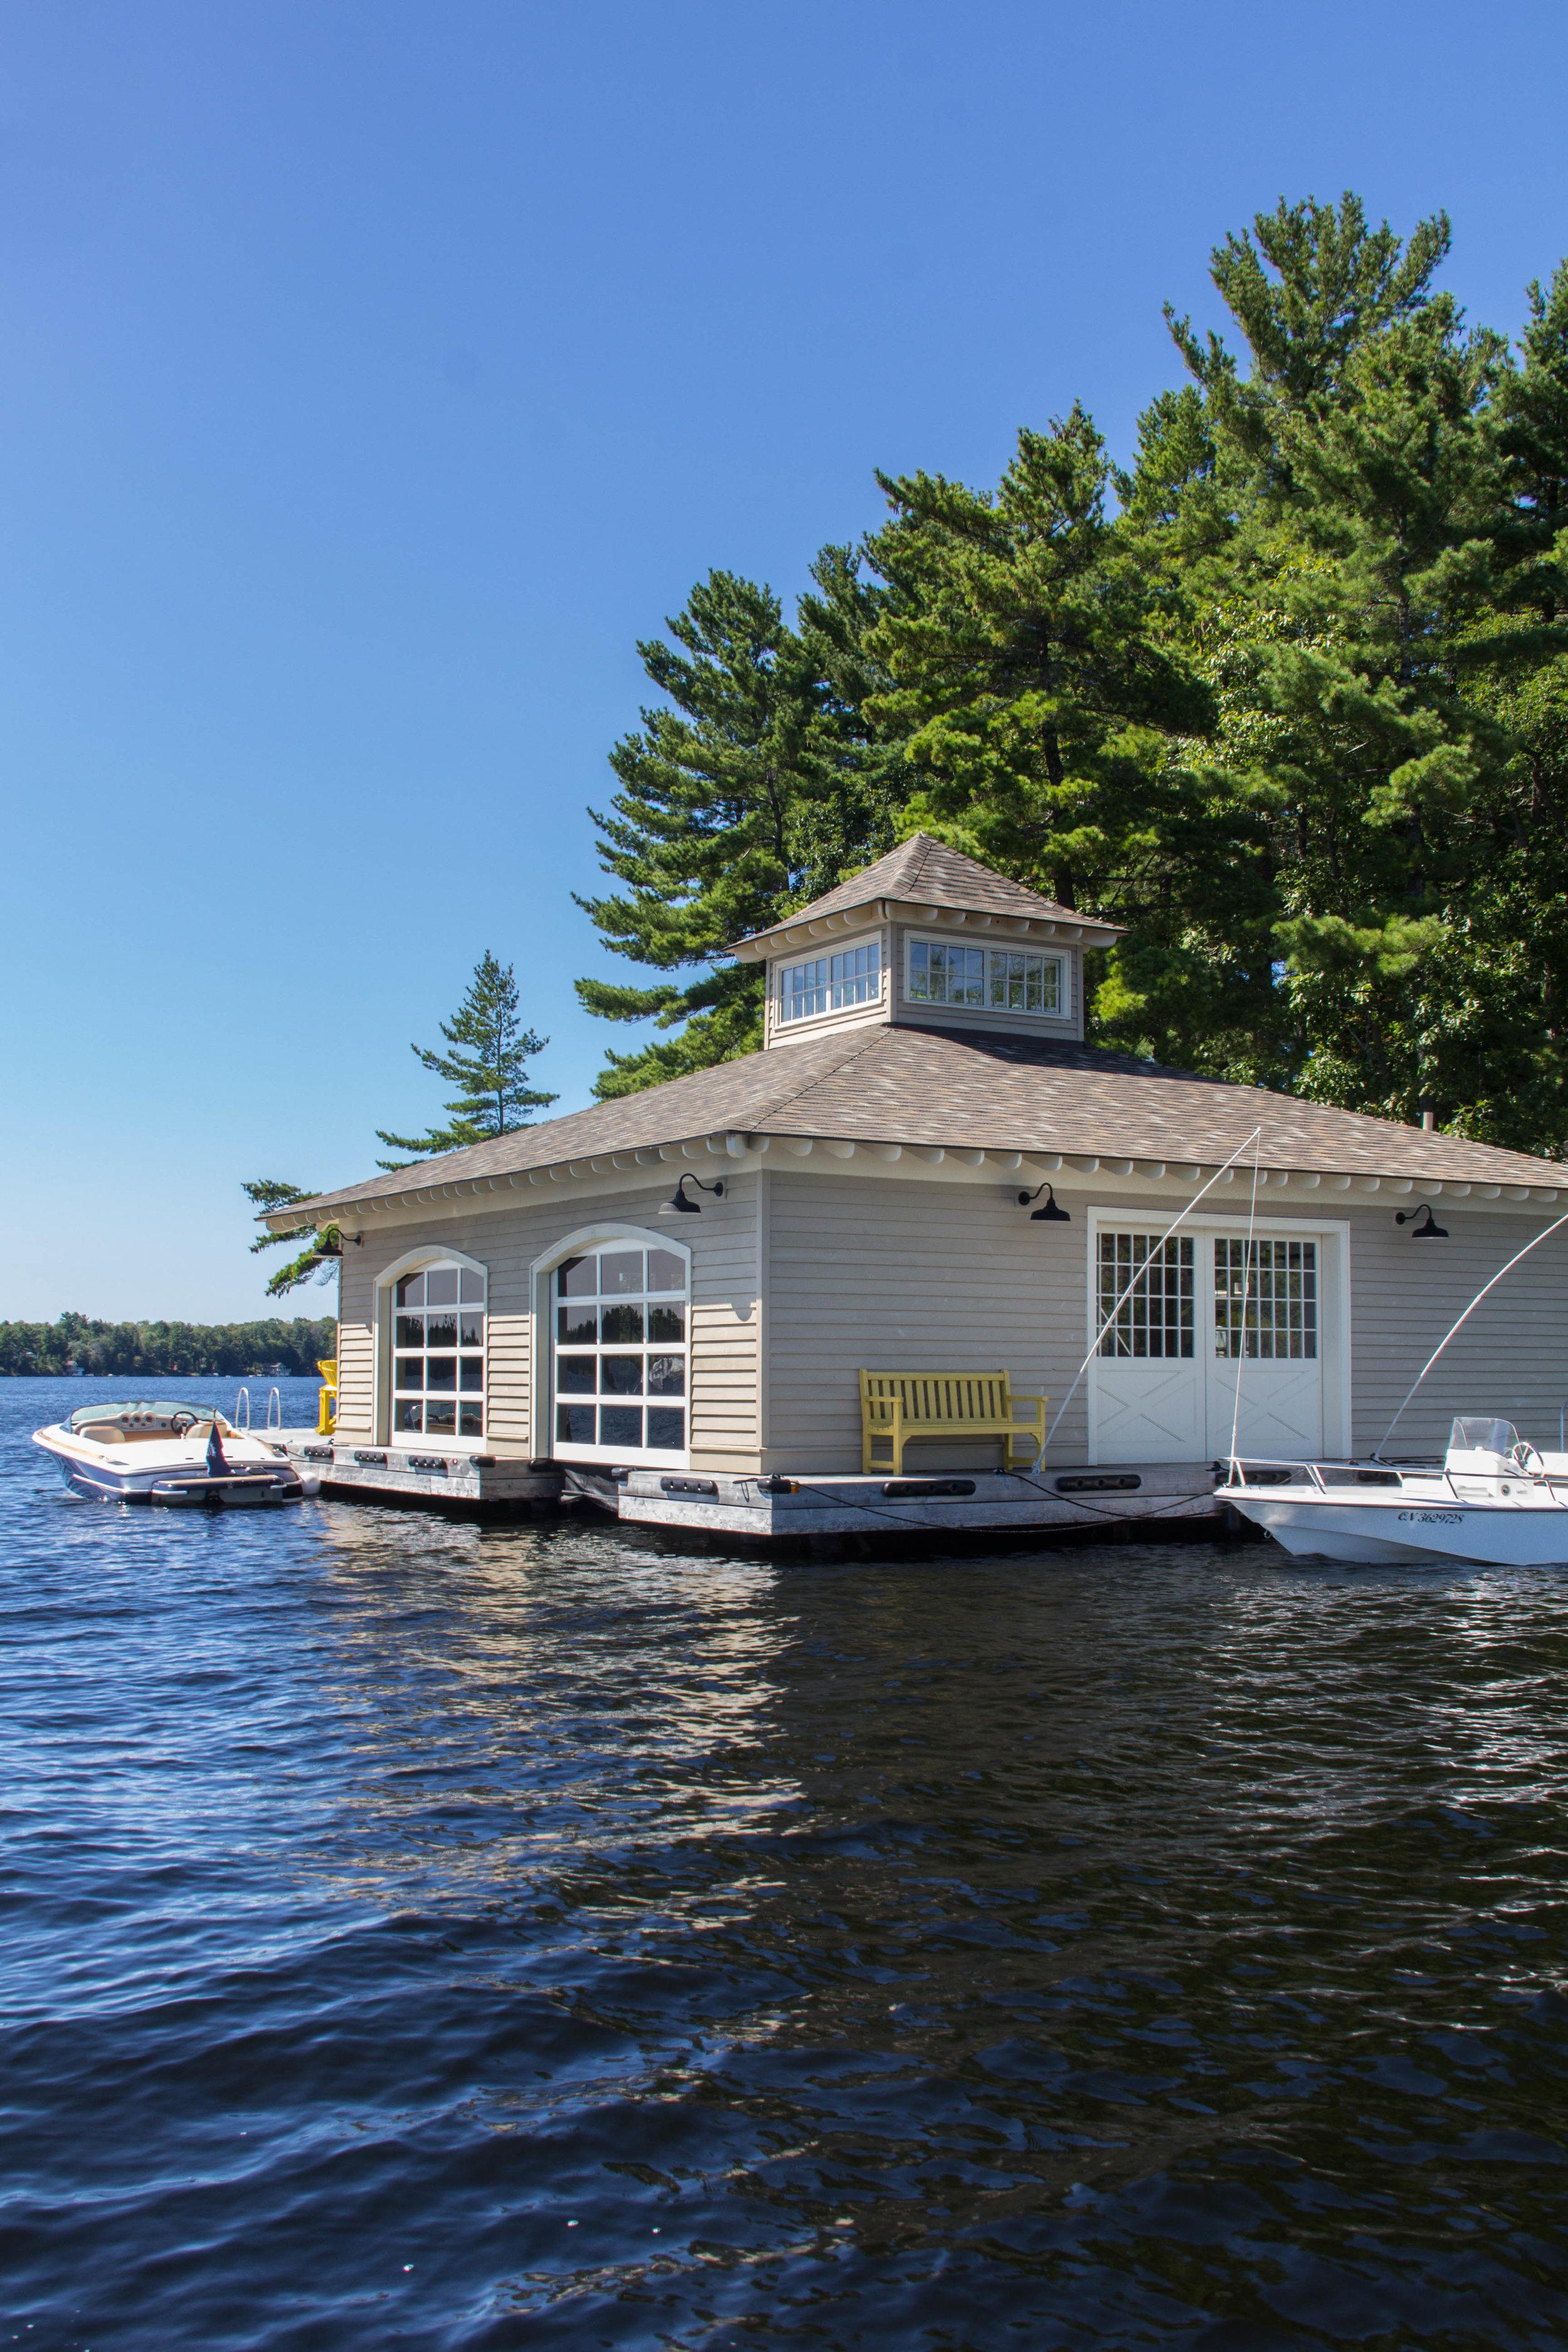 muskoka traditional boathouse - EXPLORE